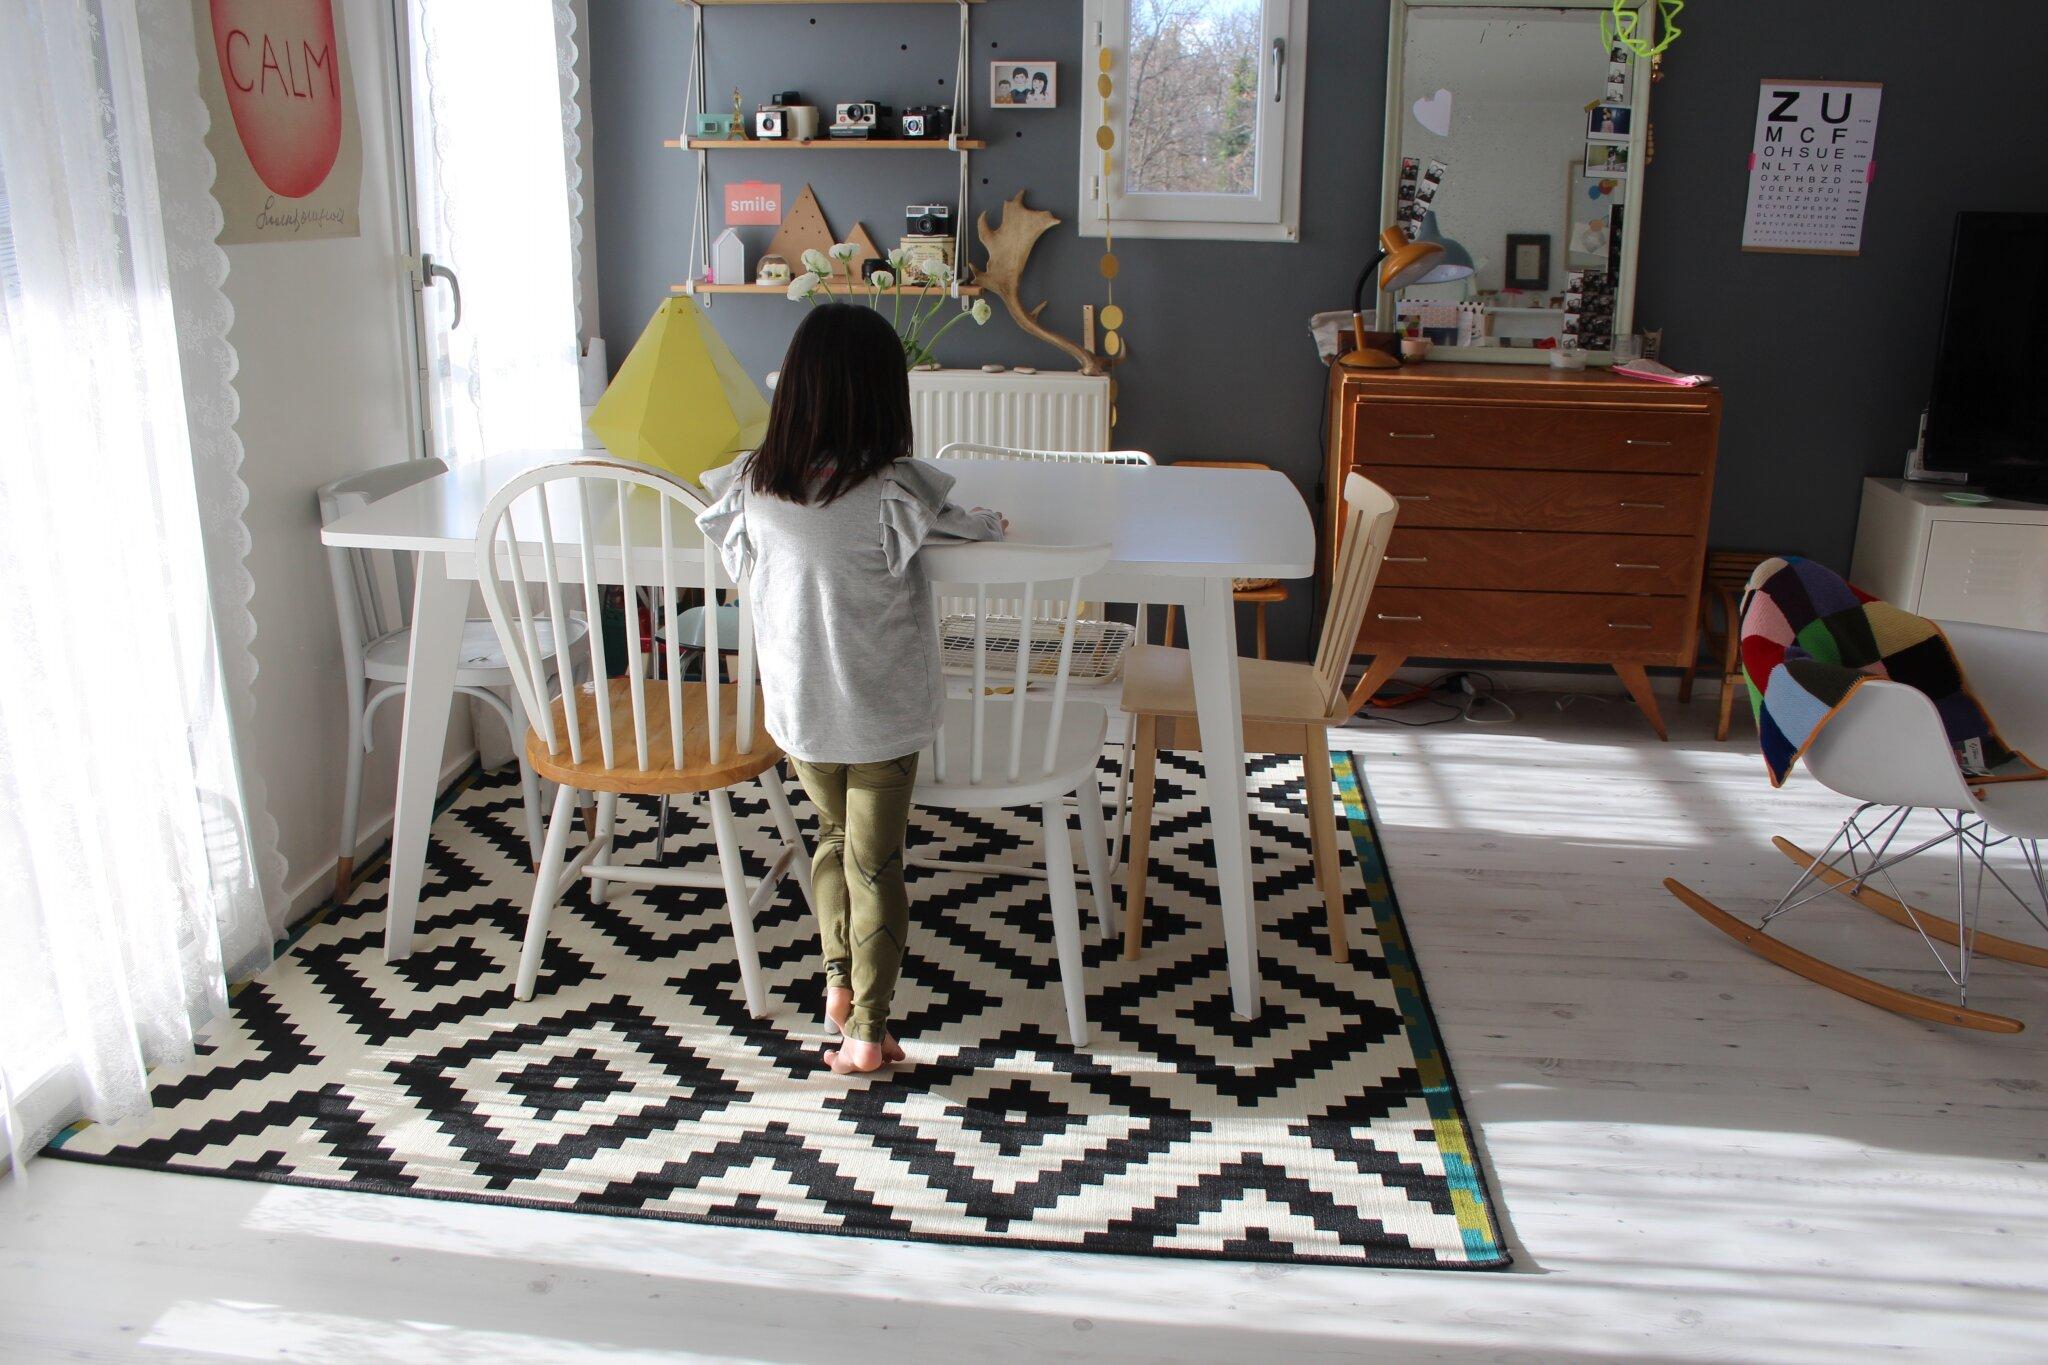 Decoracion Salon Comedor ~ Decoraci?n  Salon Comedor on Pinterest  Salons, Ikea and Eames